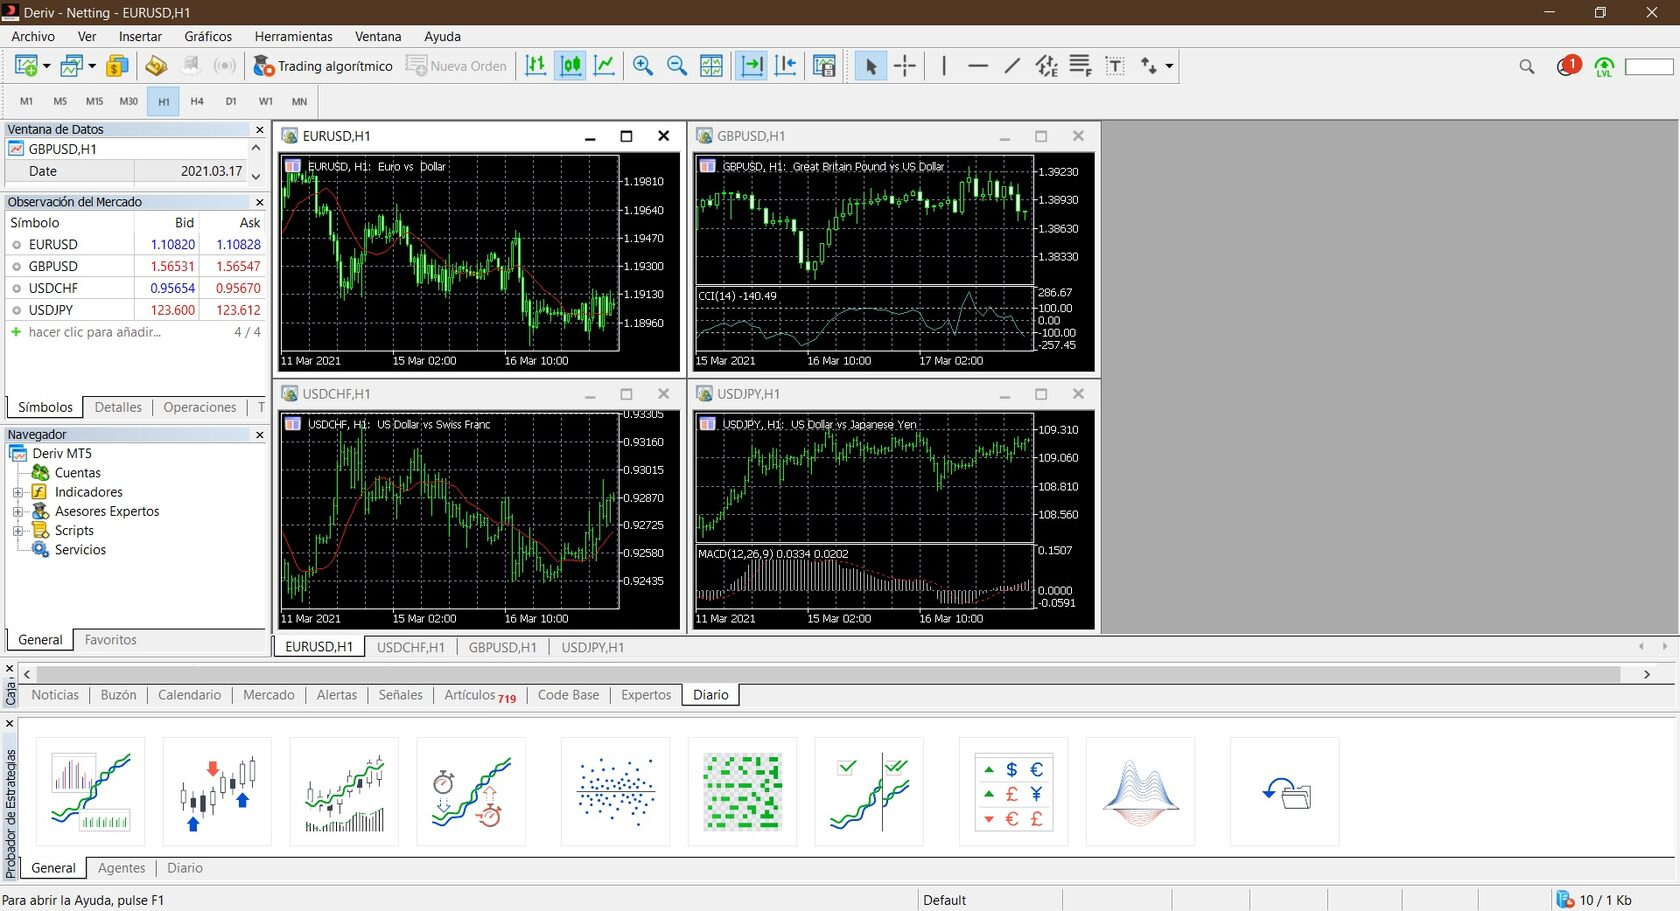 MetaTrader 5 platform interface